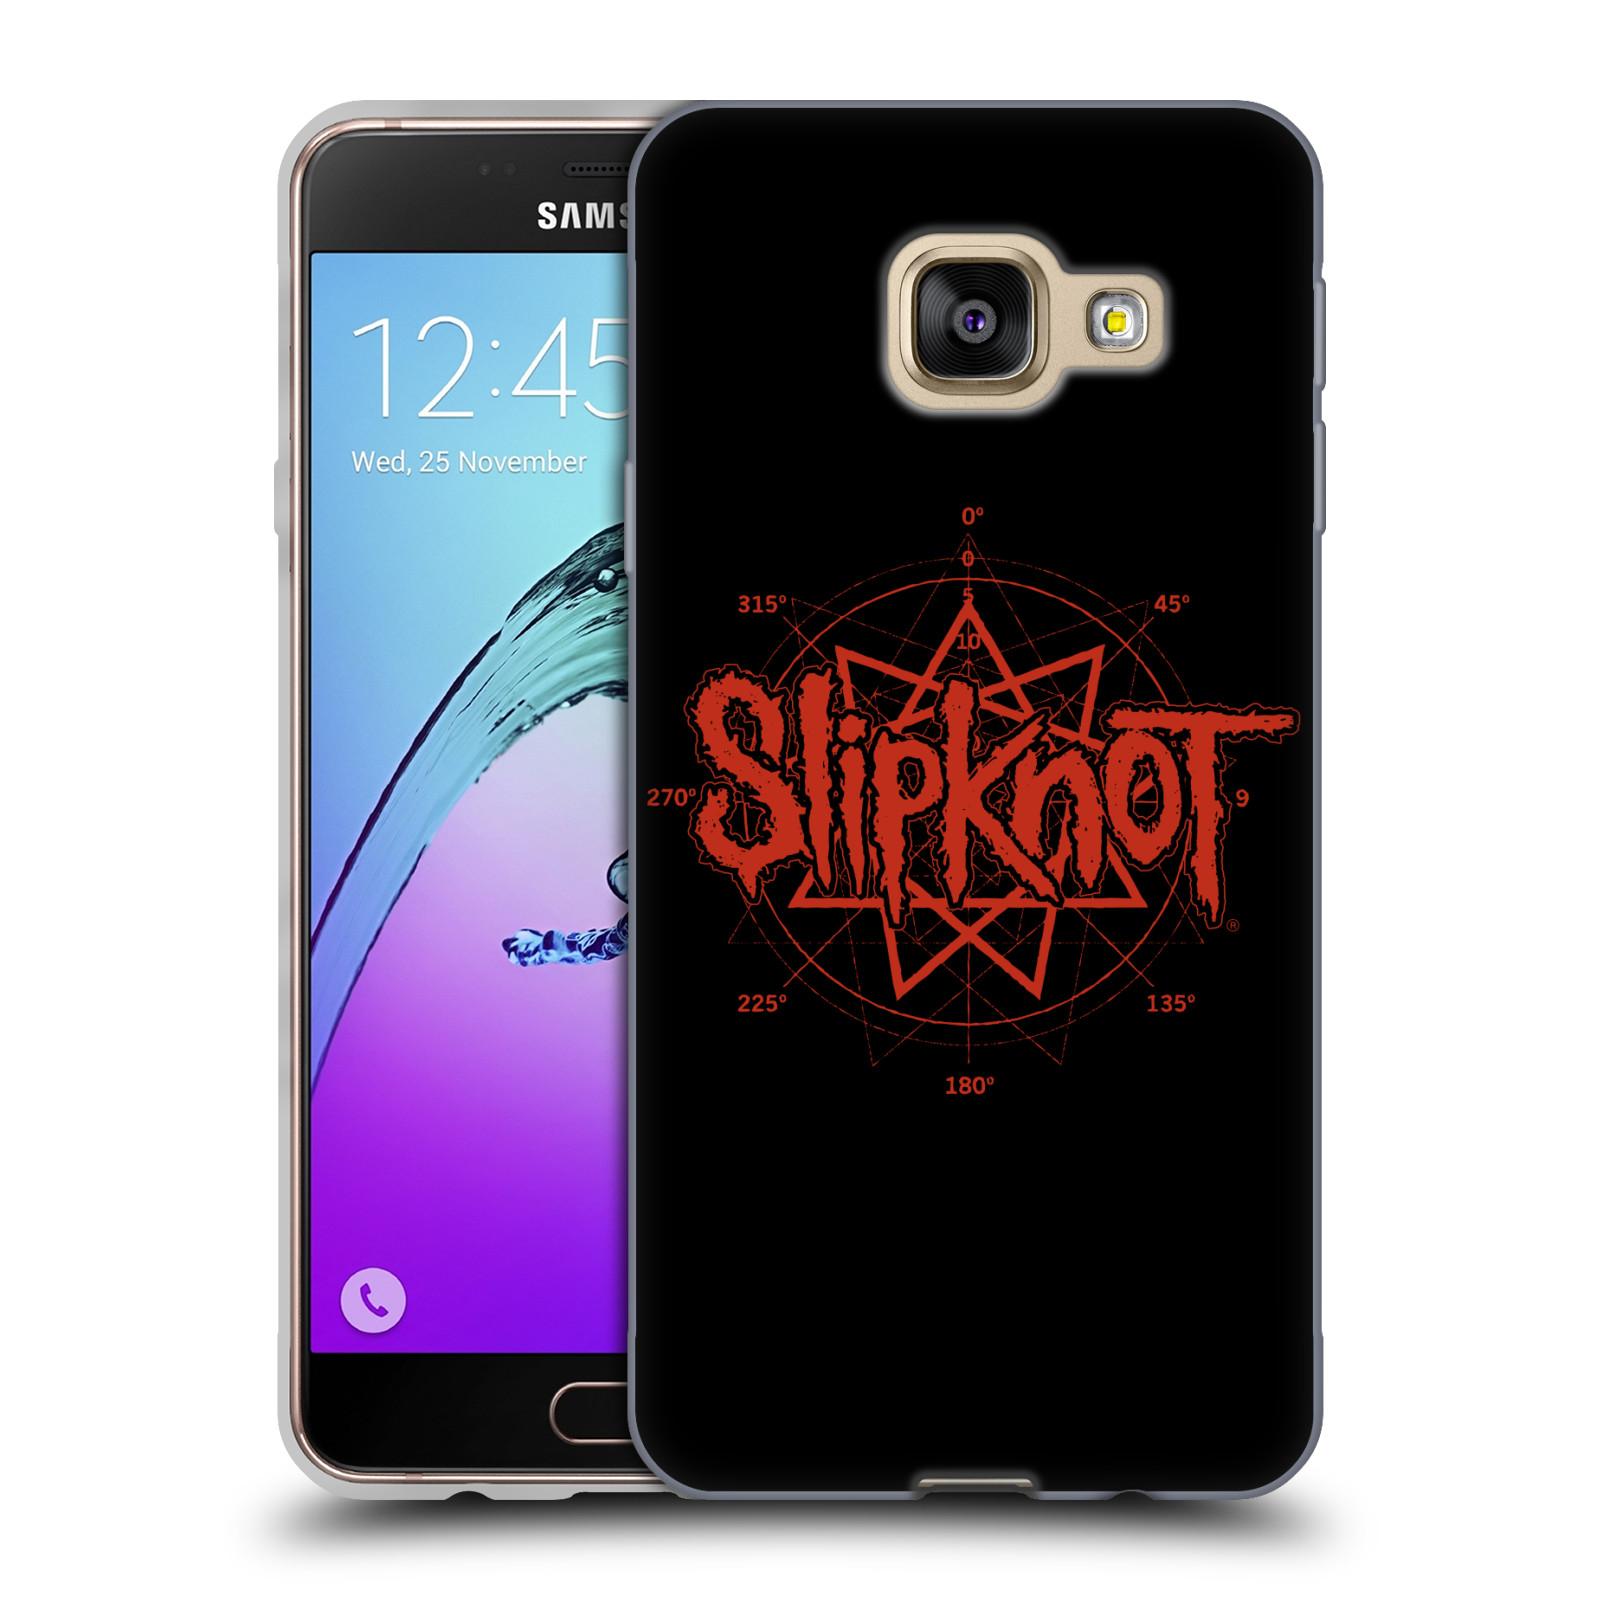 HEAD CASE silikonový obal na mobil Samsung Galaxy A3 2016 (A310) hudební skupina Slipknot logo